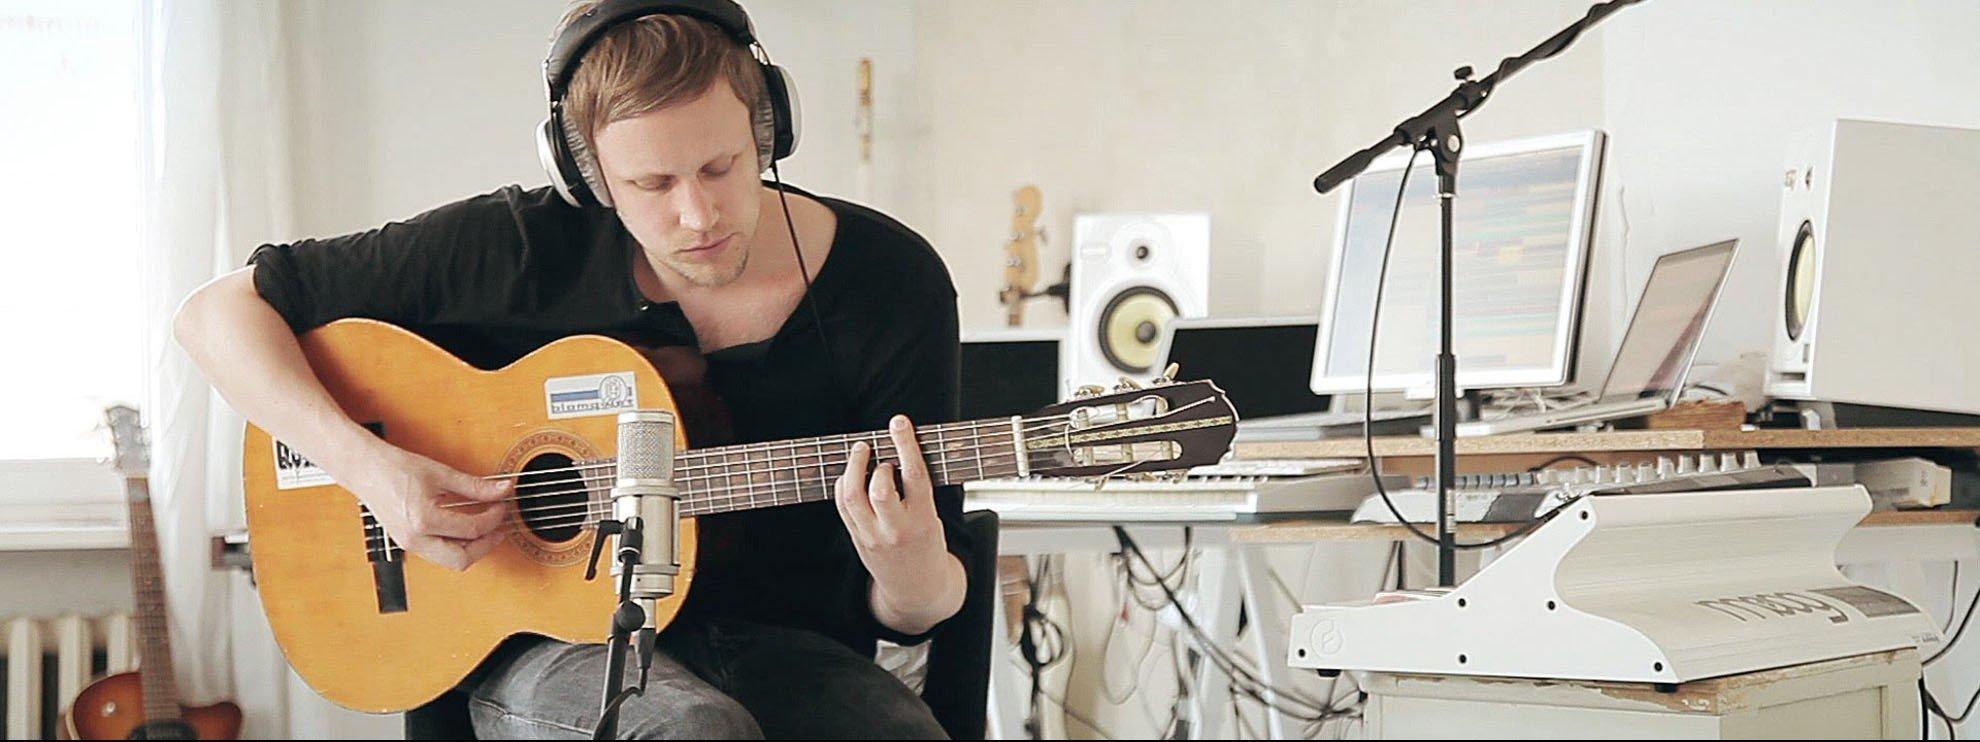 виконавець Jan Blomqvist & Band (Жан Блумквіст енд Бенд)